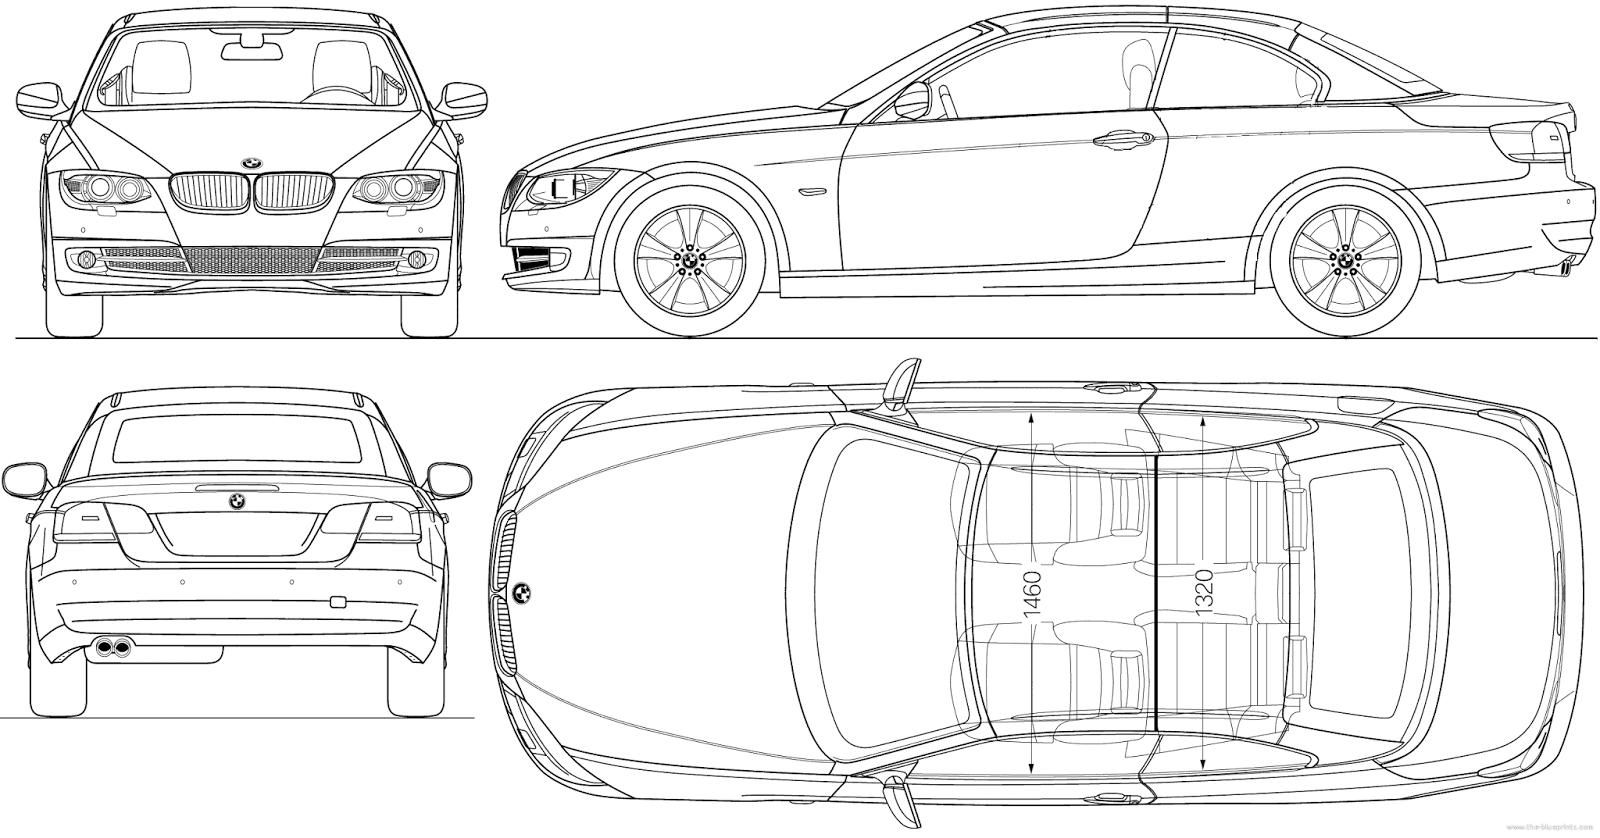 CGfrog: Most Loved Car Blueprints for 3D Modeling